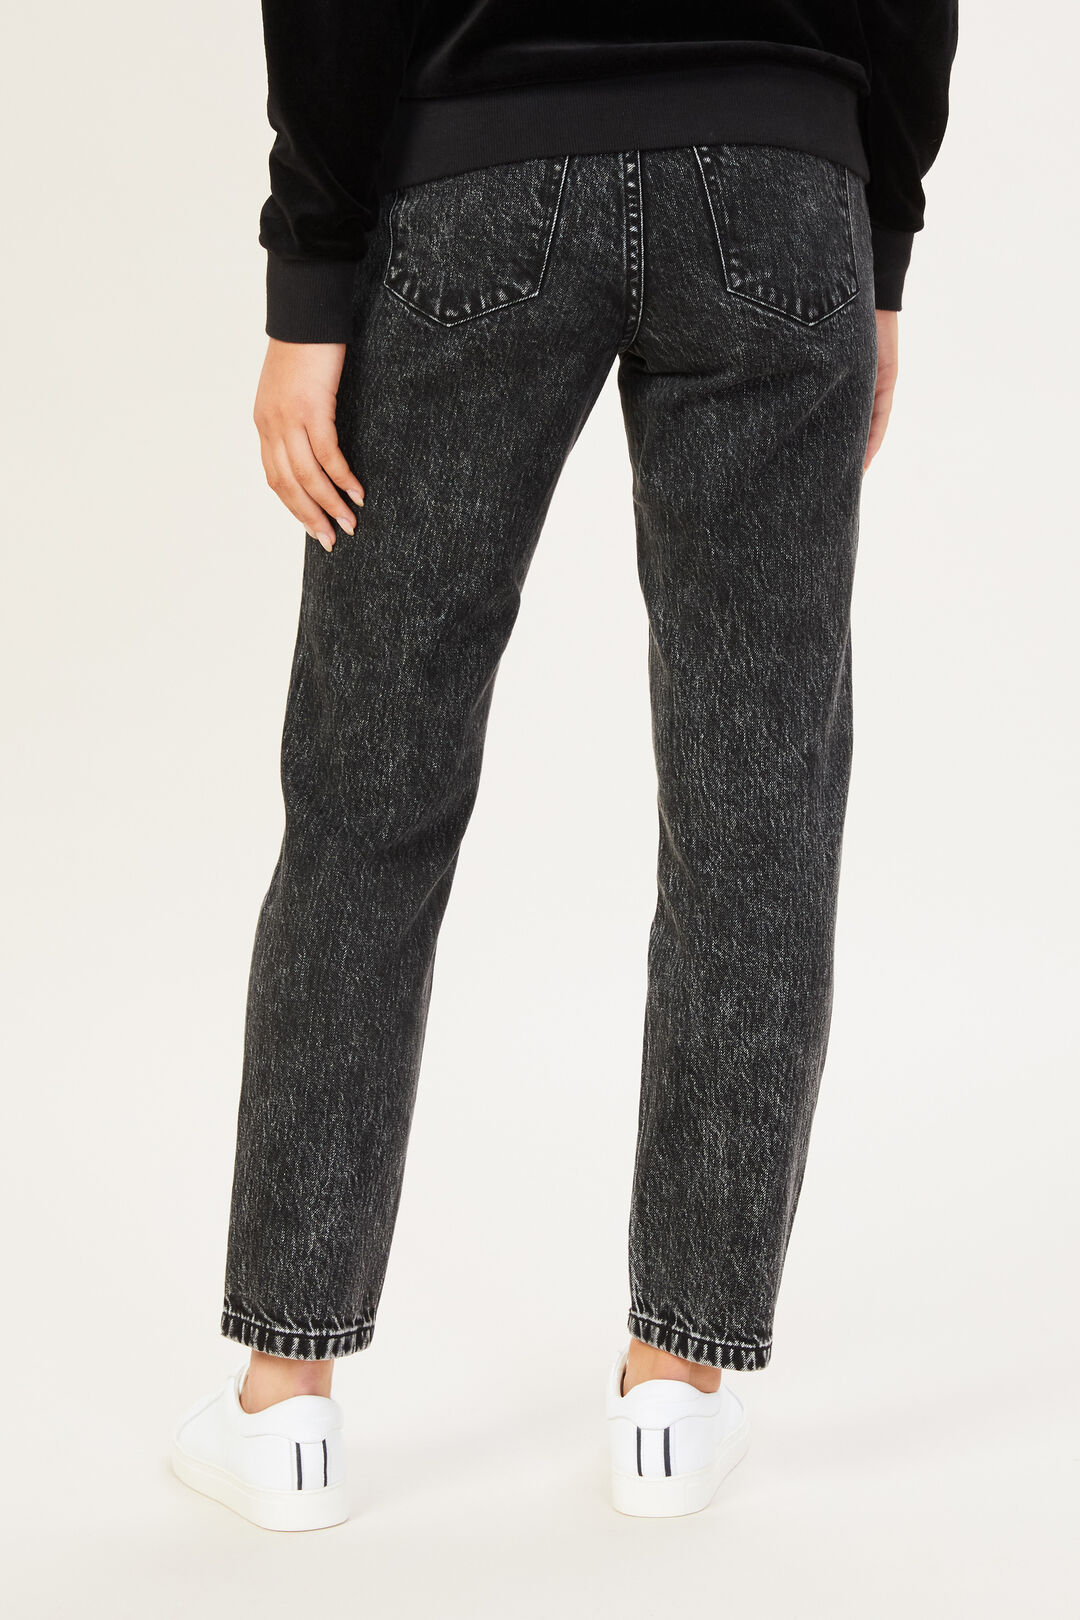 HIGH RISE STRAIGHT LEG JEAN  WASHED BLACK  hi-res